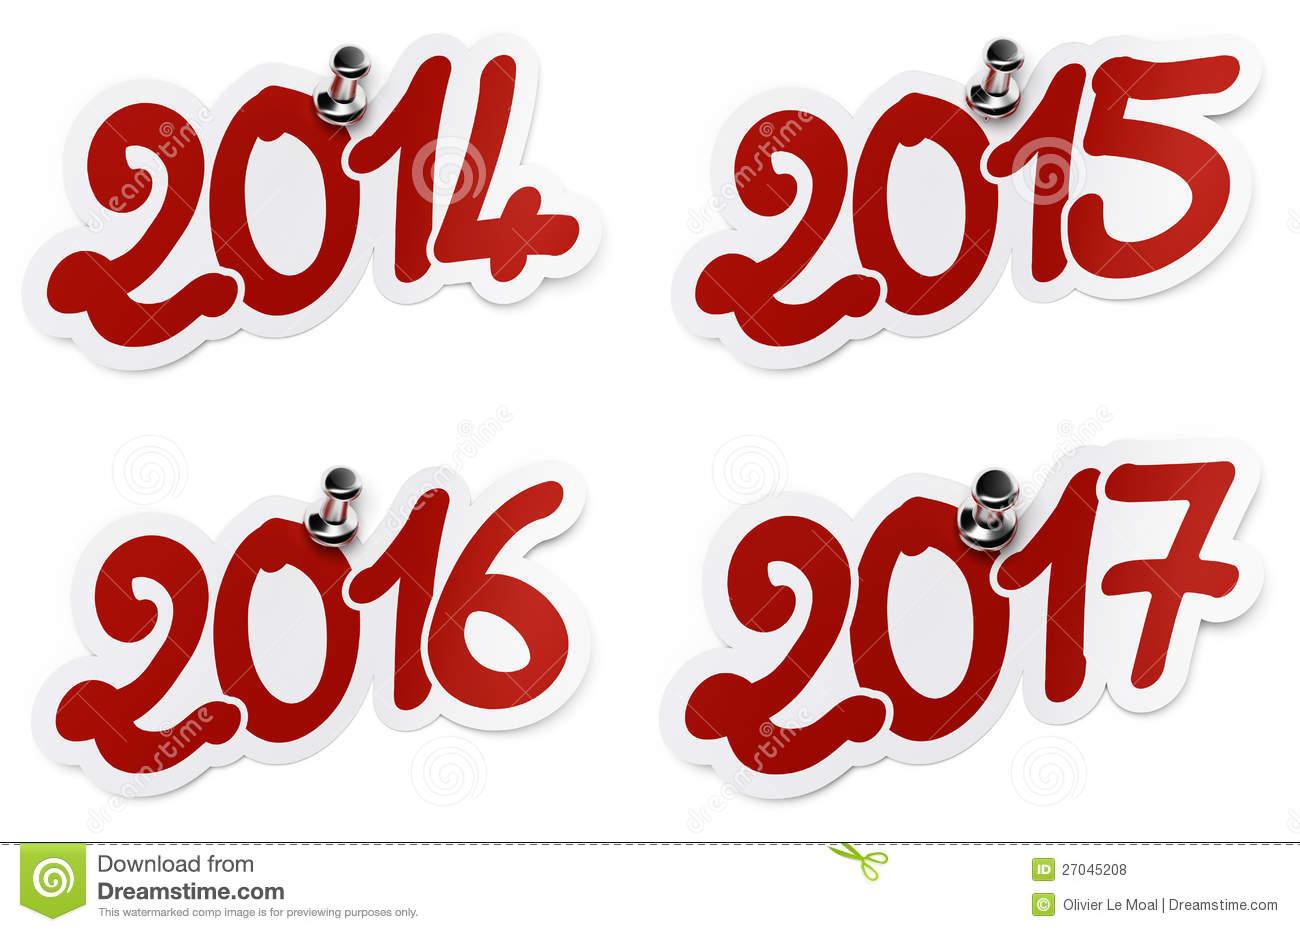 2016 Clipart.